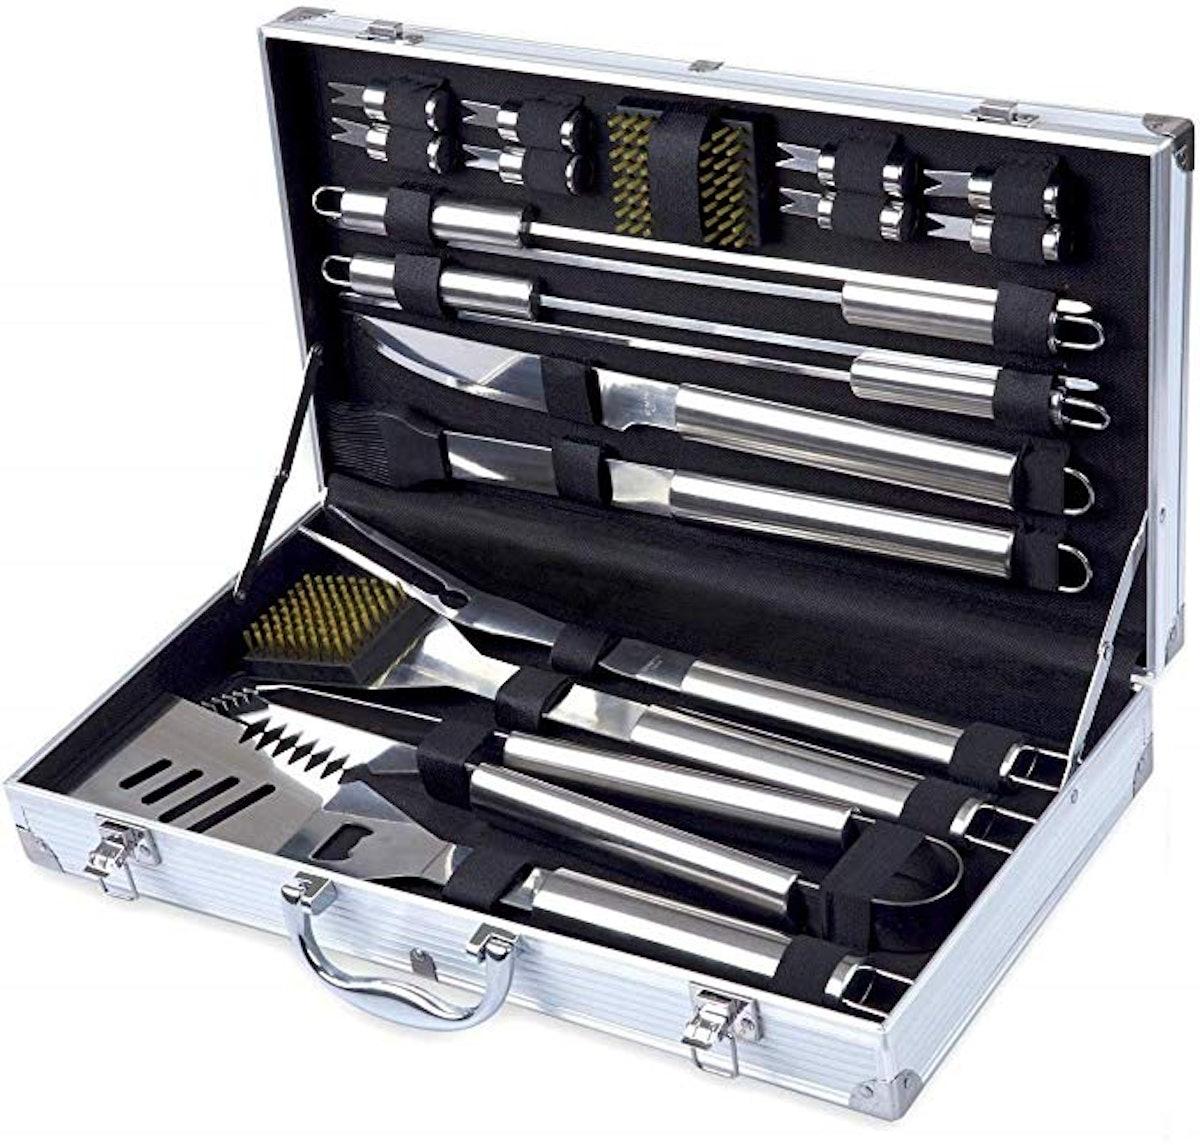 Grill Utensil Set with Storage Case (19-Piece Set)